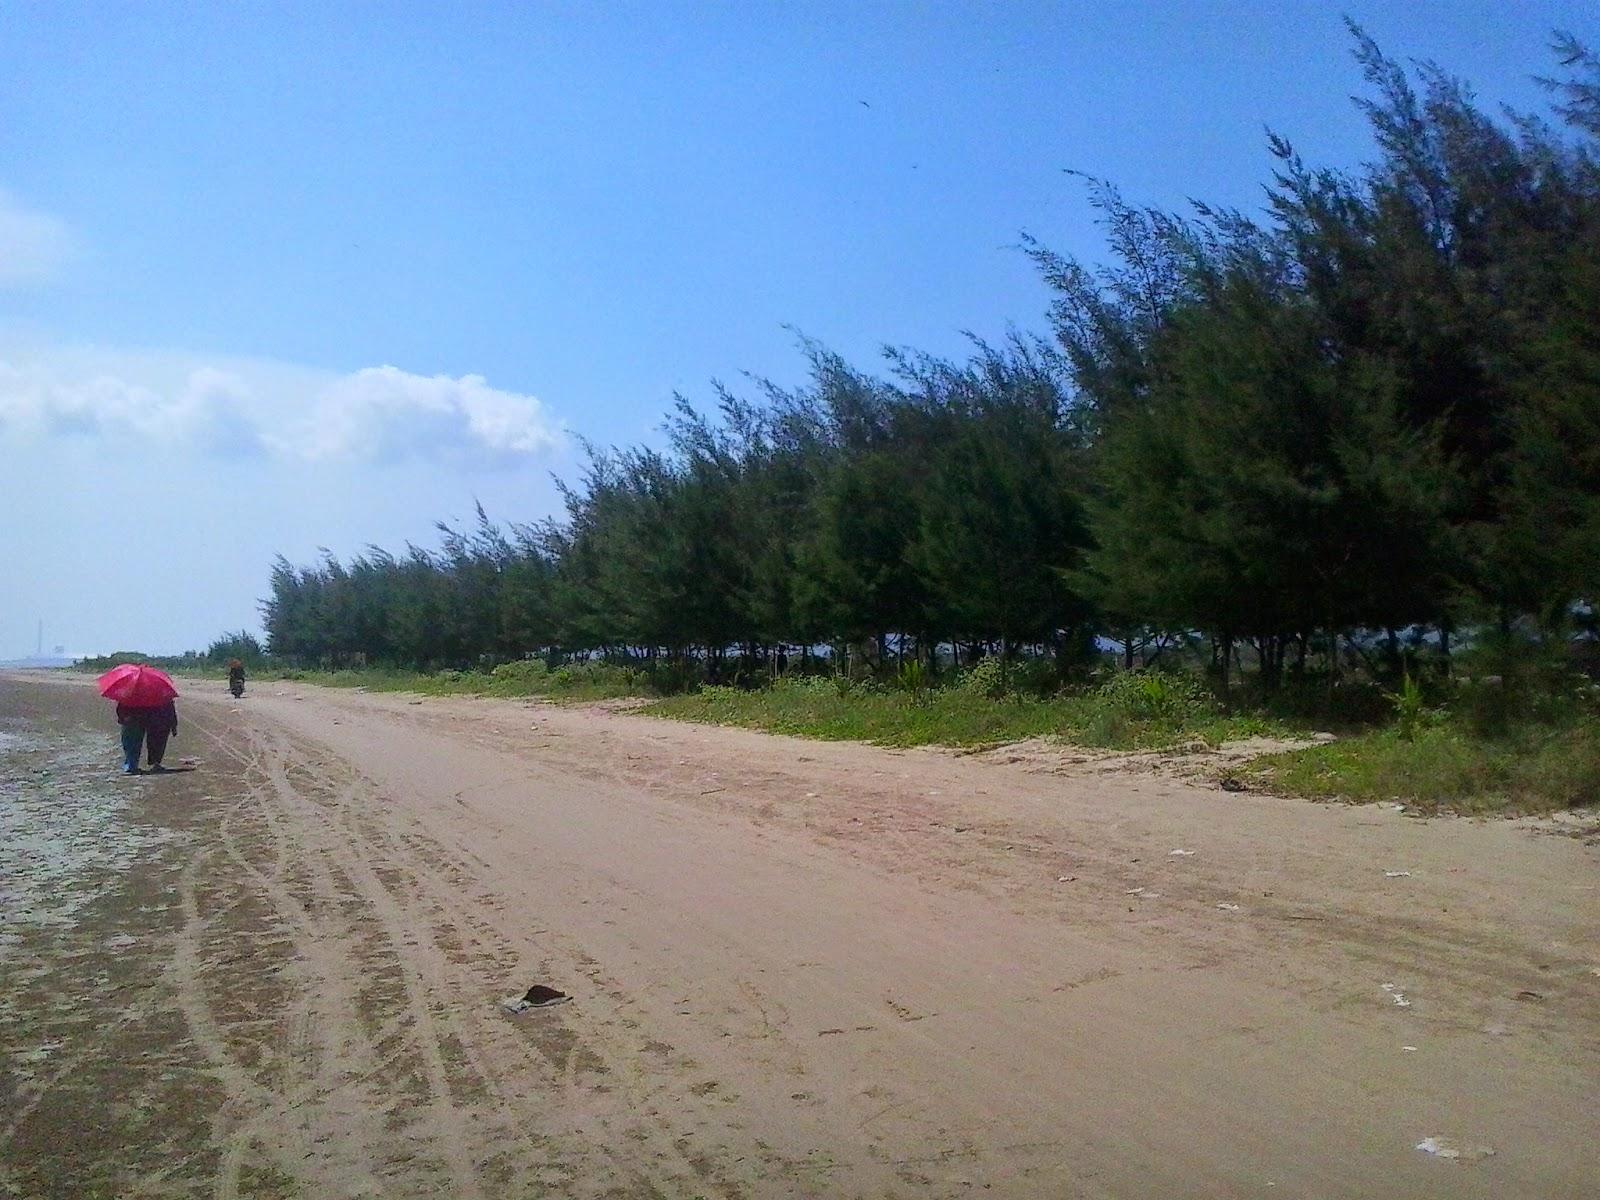 Pantai Caruban Kejauhan Merapat Mengunjungi Tempat Wisata Lasem Gedongmulyo Rembang